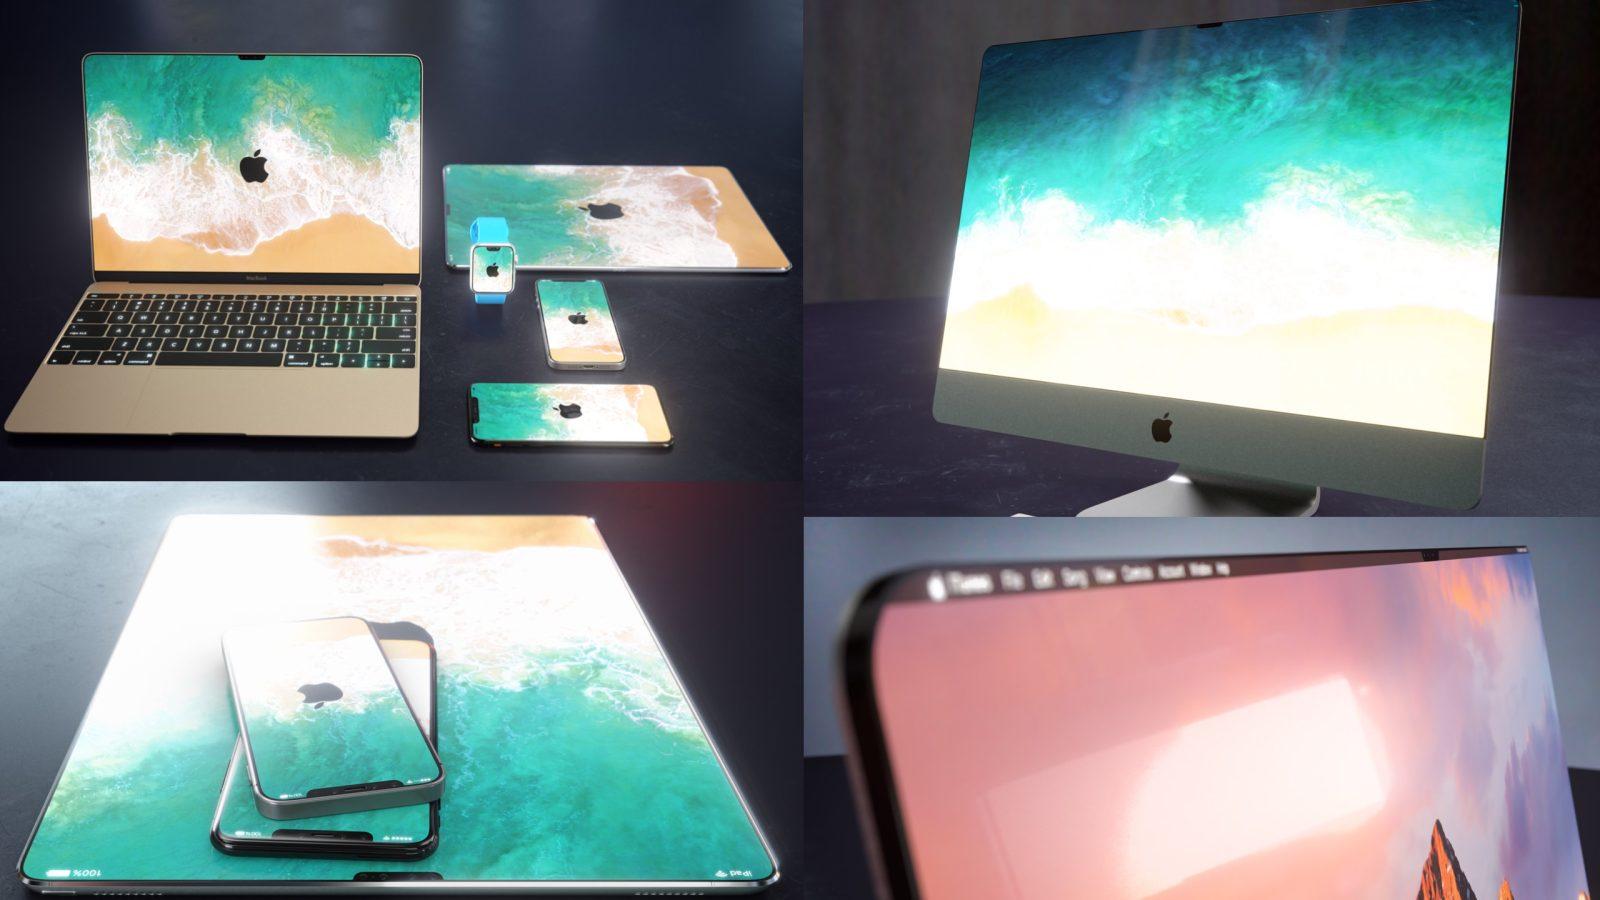 New renders imagine iPhone X notch + bezel design coming to MacBook, iMac, iPad, more [Gallery]